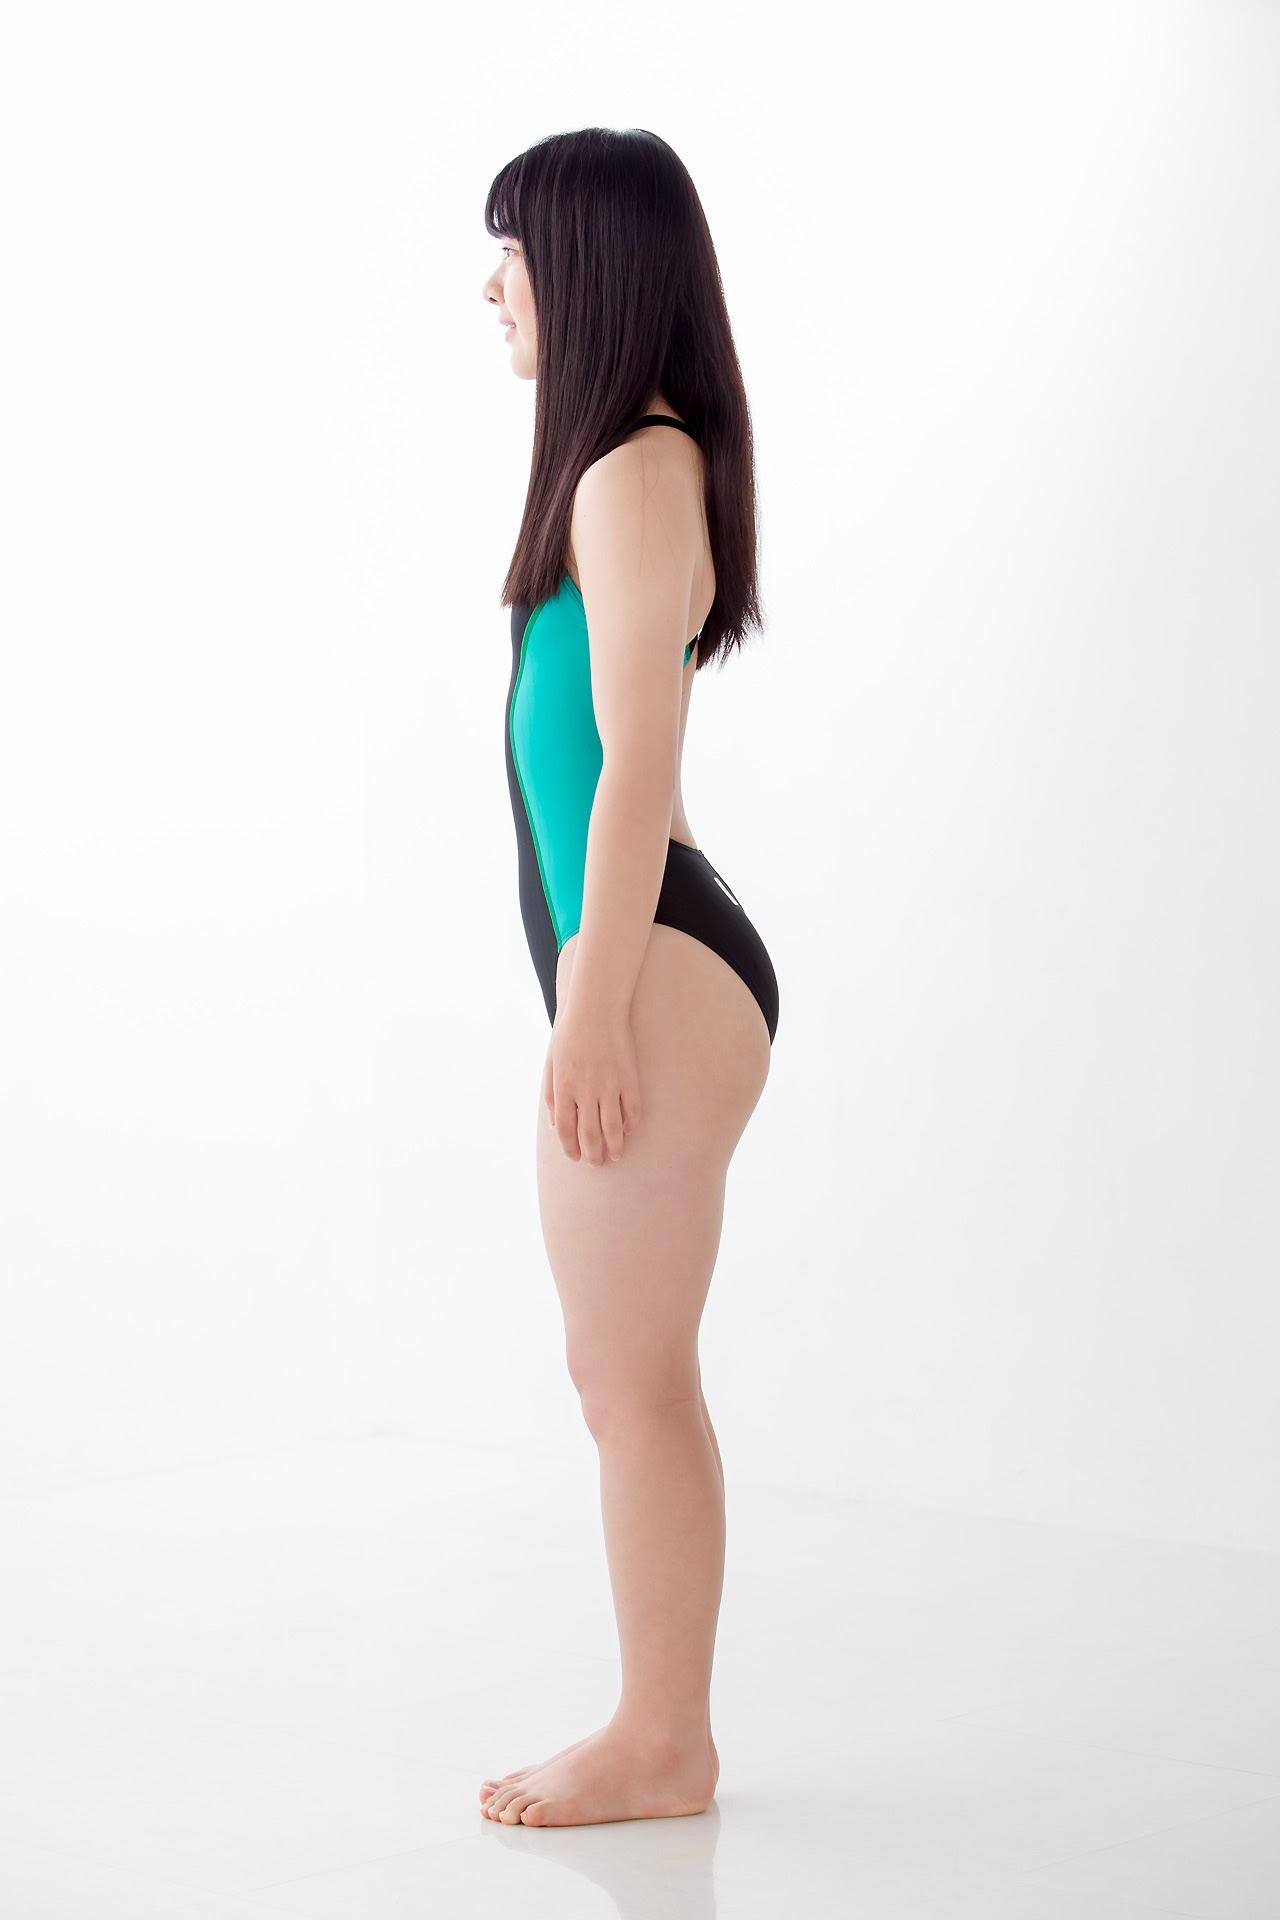 SARIA NATSUME -003